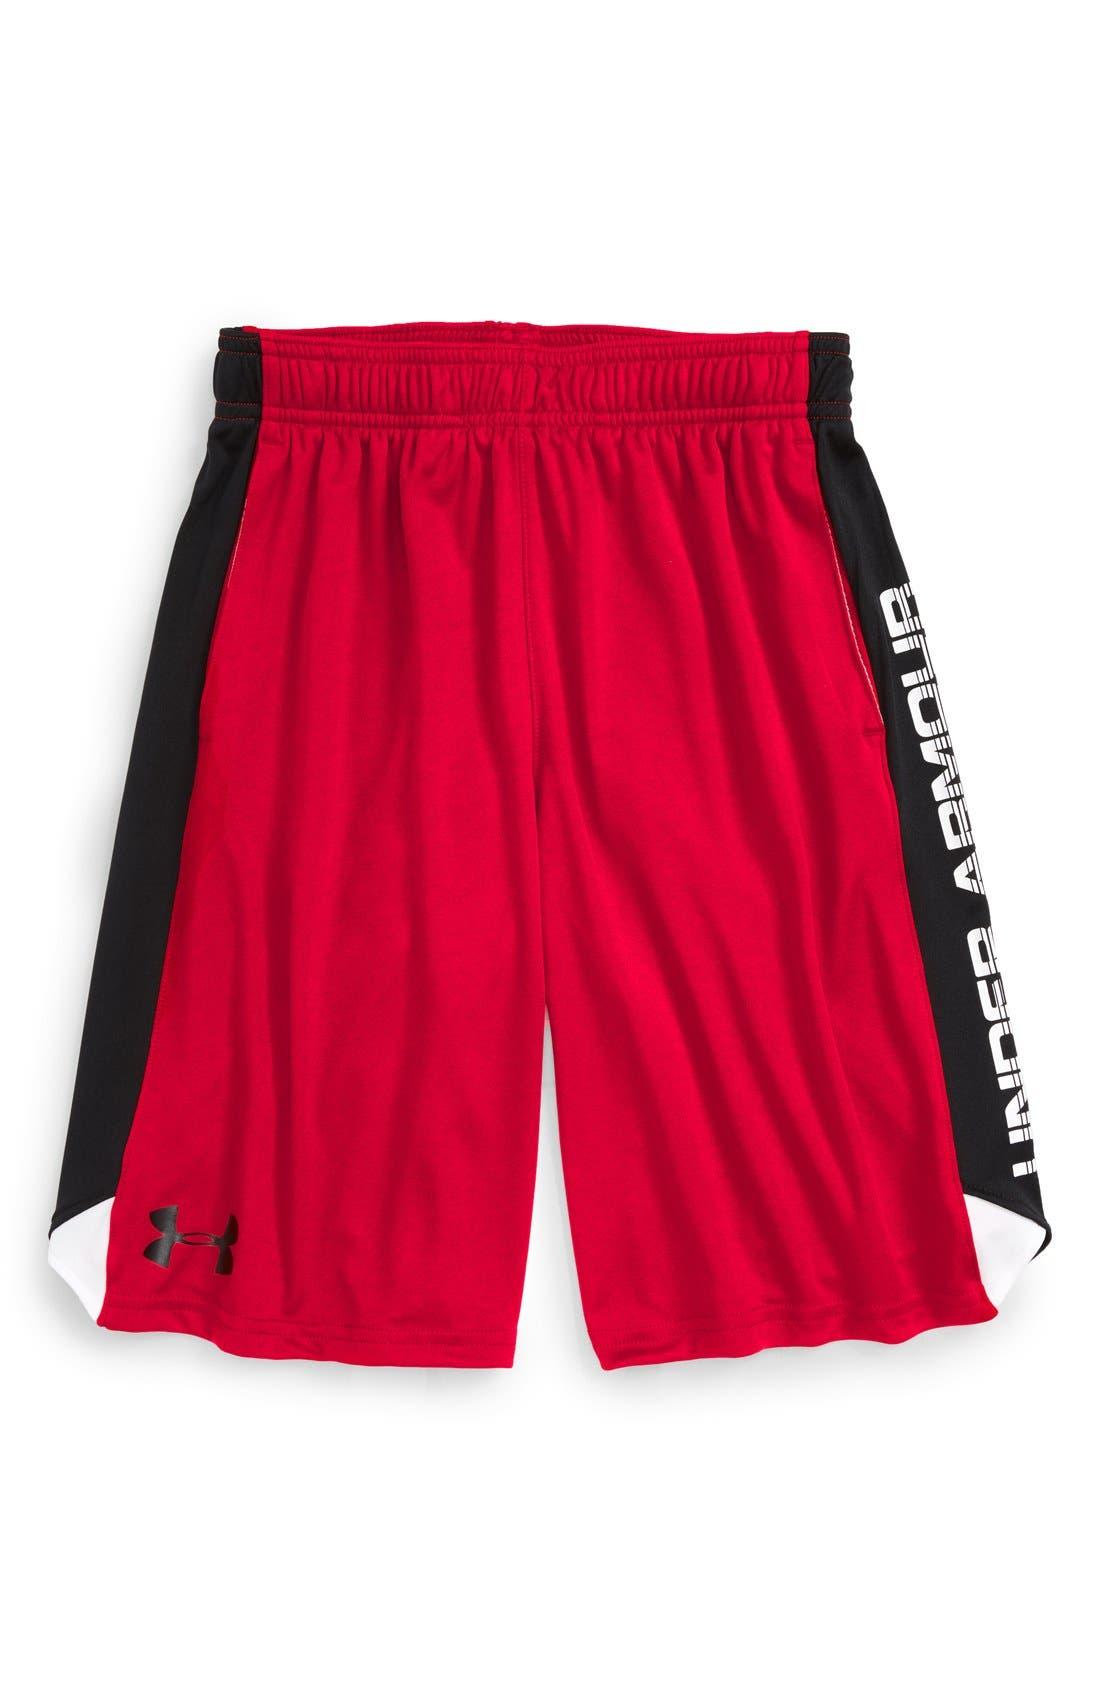 Main Image - Under Armour 'Eliminator' HeatGear® Shorts (Big Boys)